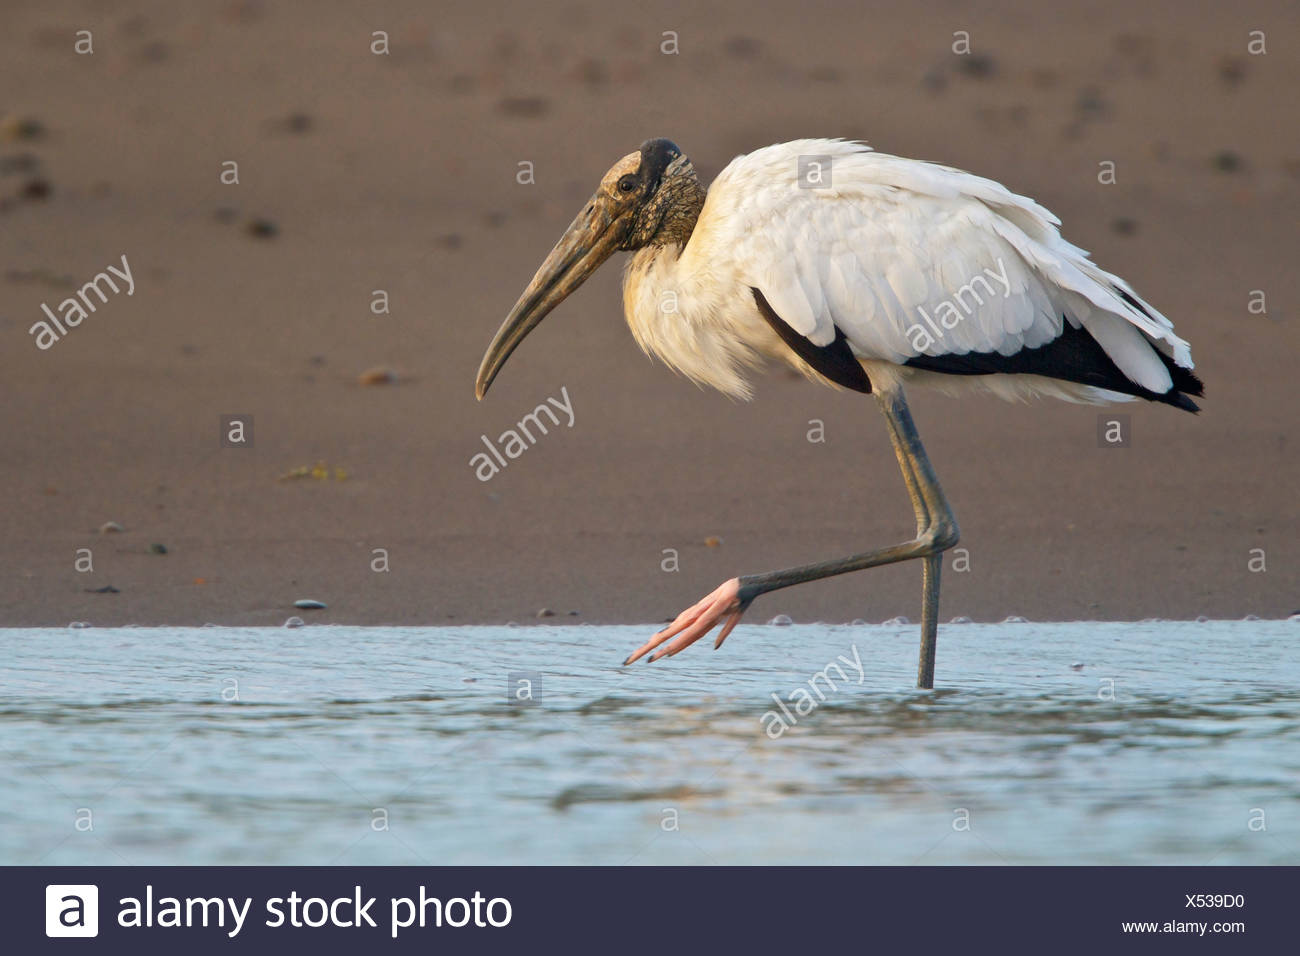 Wood Stork (Mycteria americana) feeding along a river in Costa Rica. - Stock Image